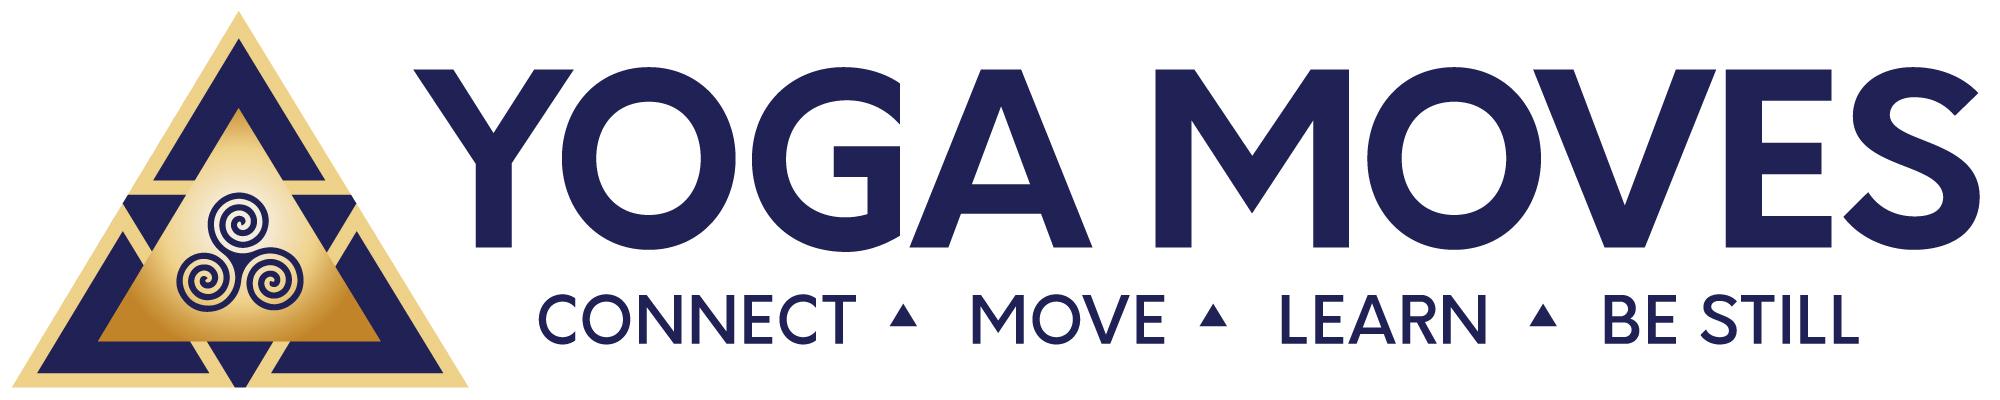 Business Profile: Yoga Moves